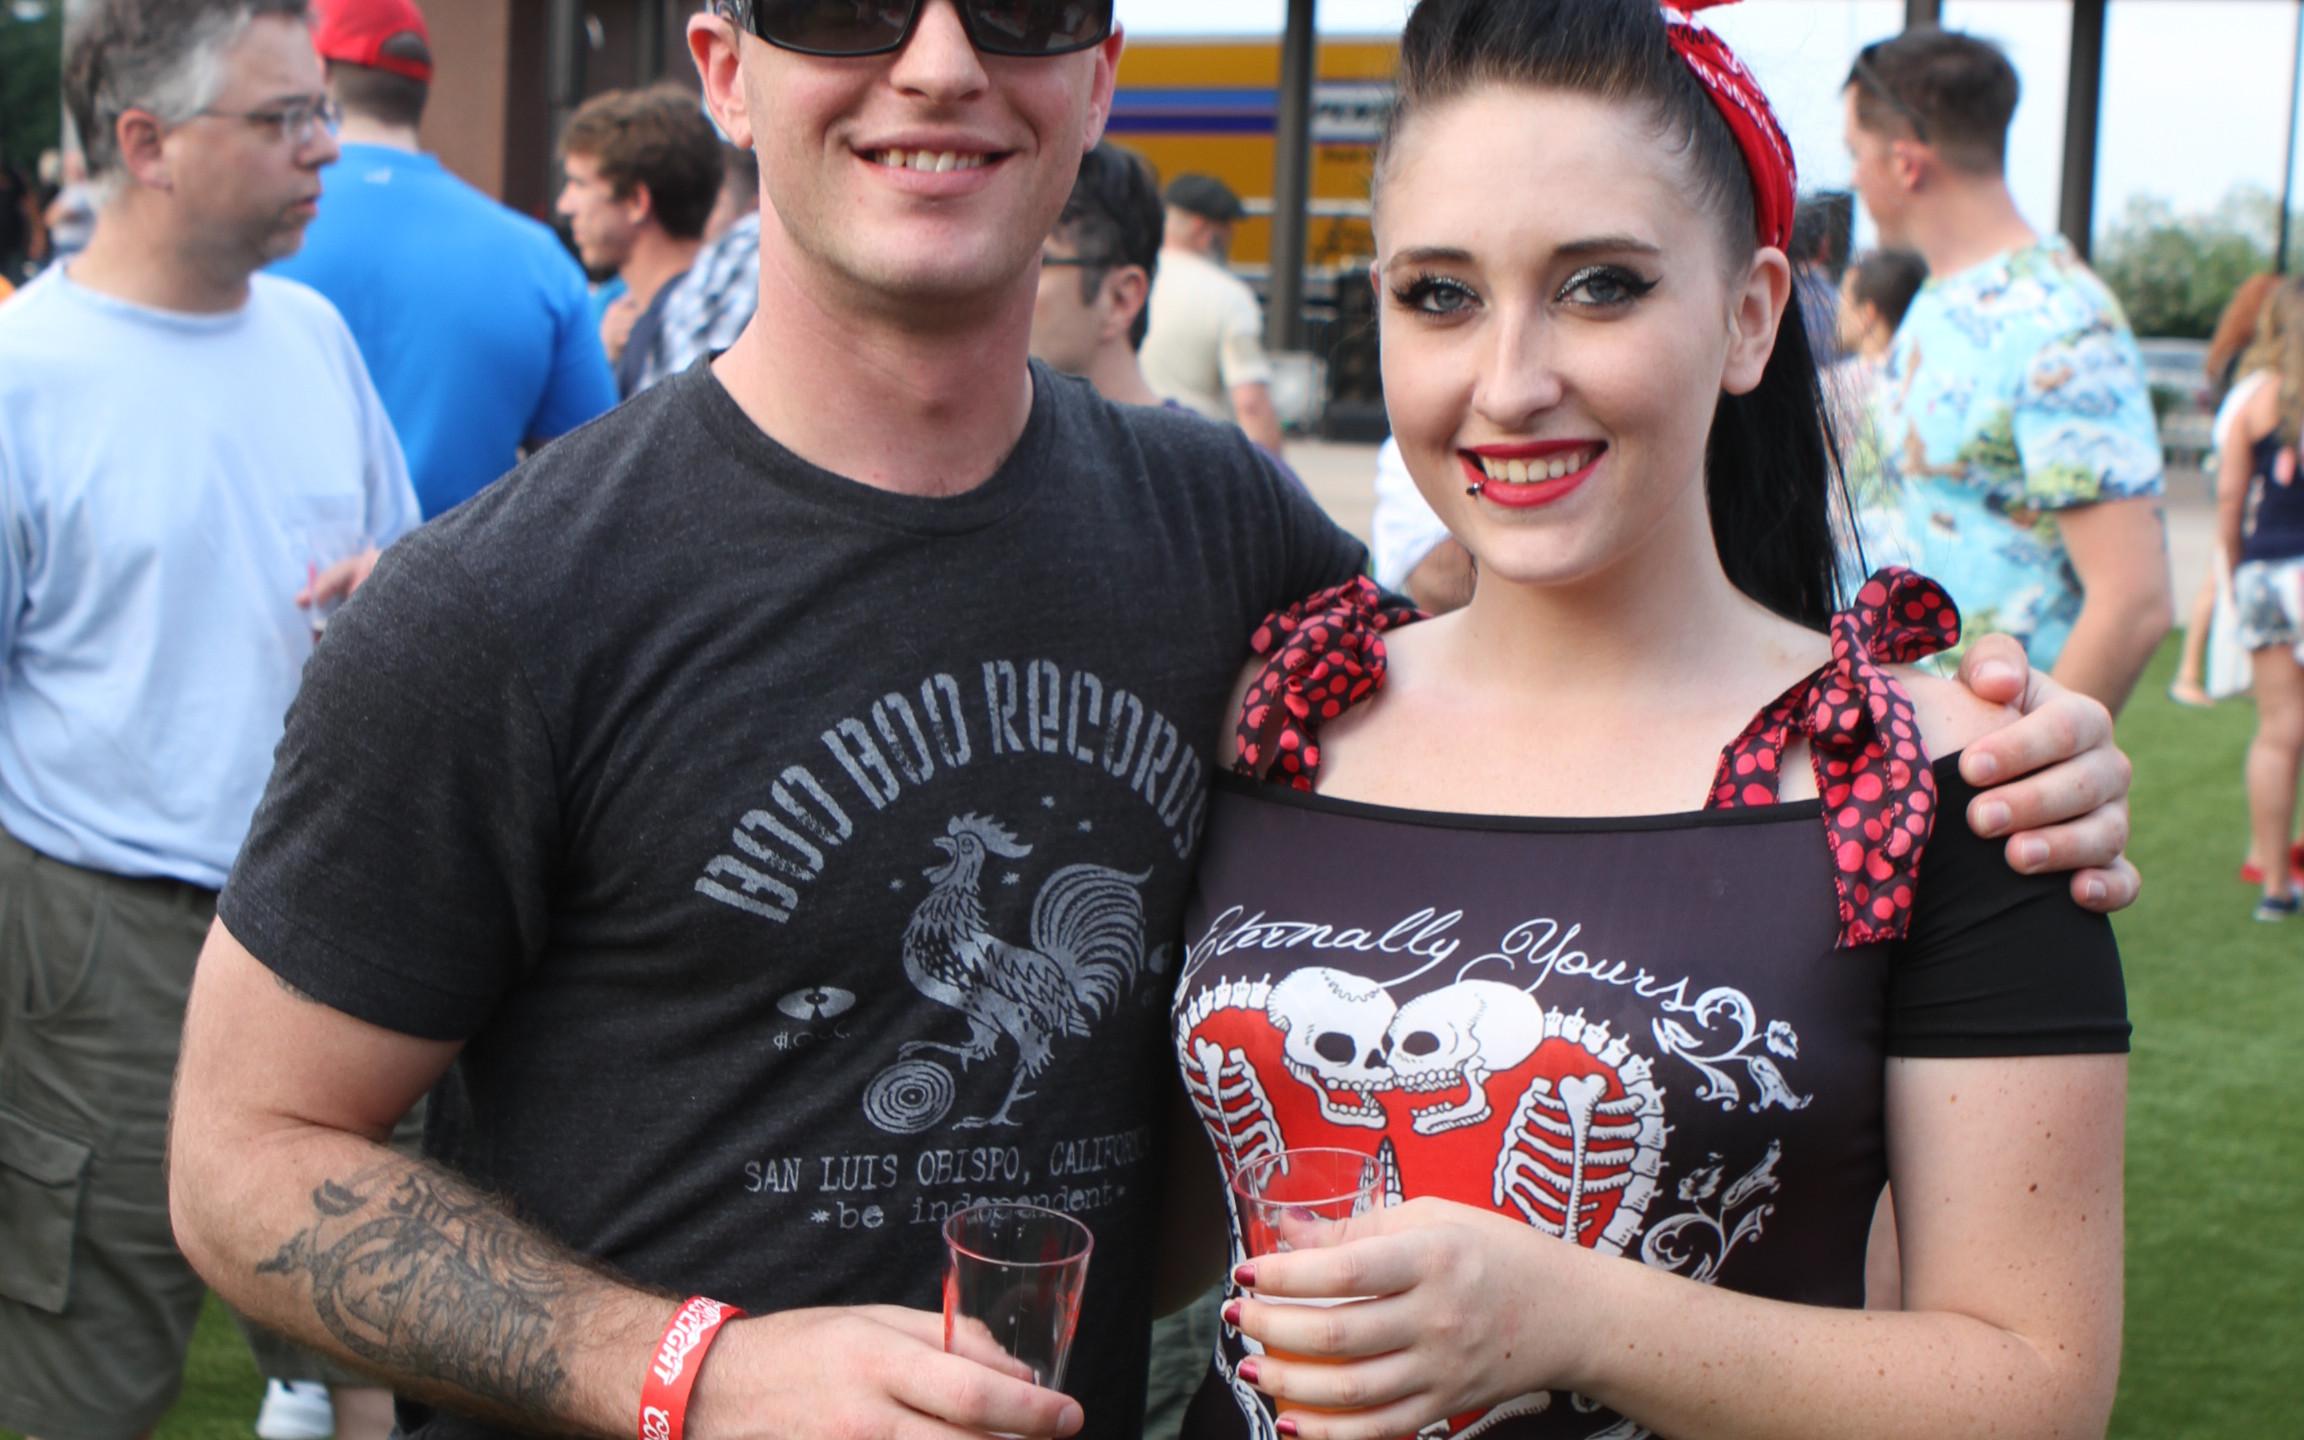 Logan Brouillet and Tabitha Lasing